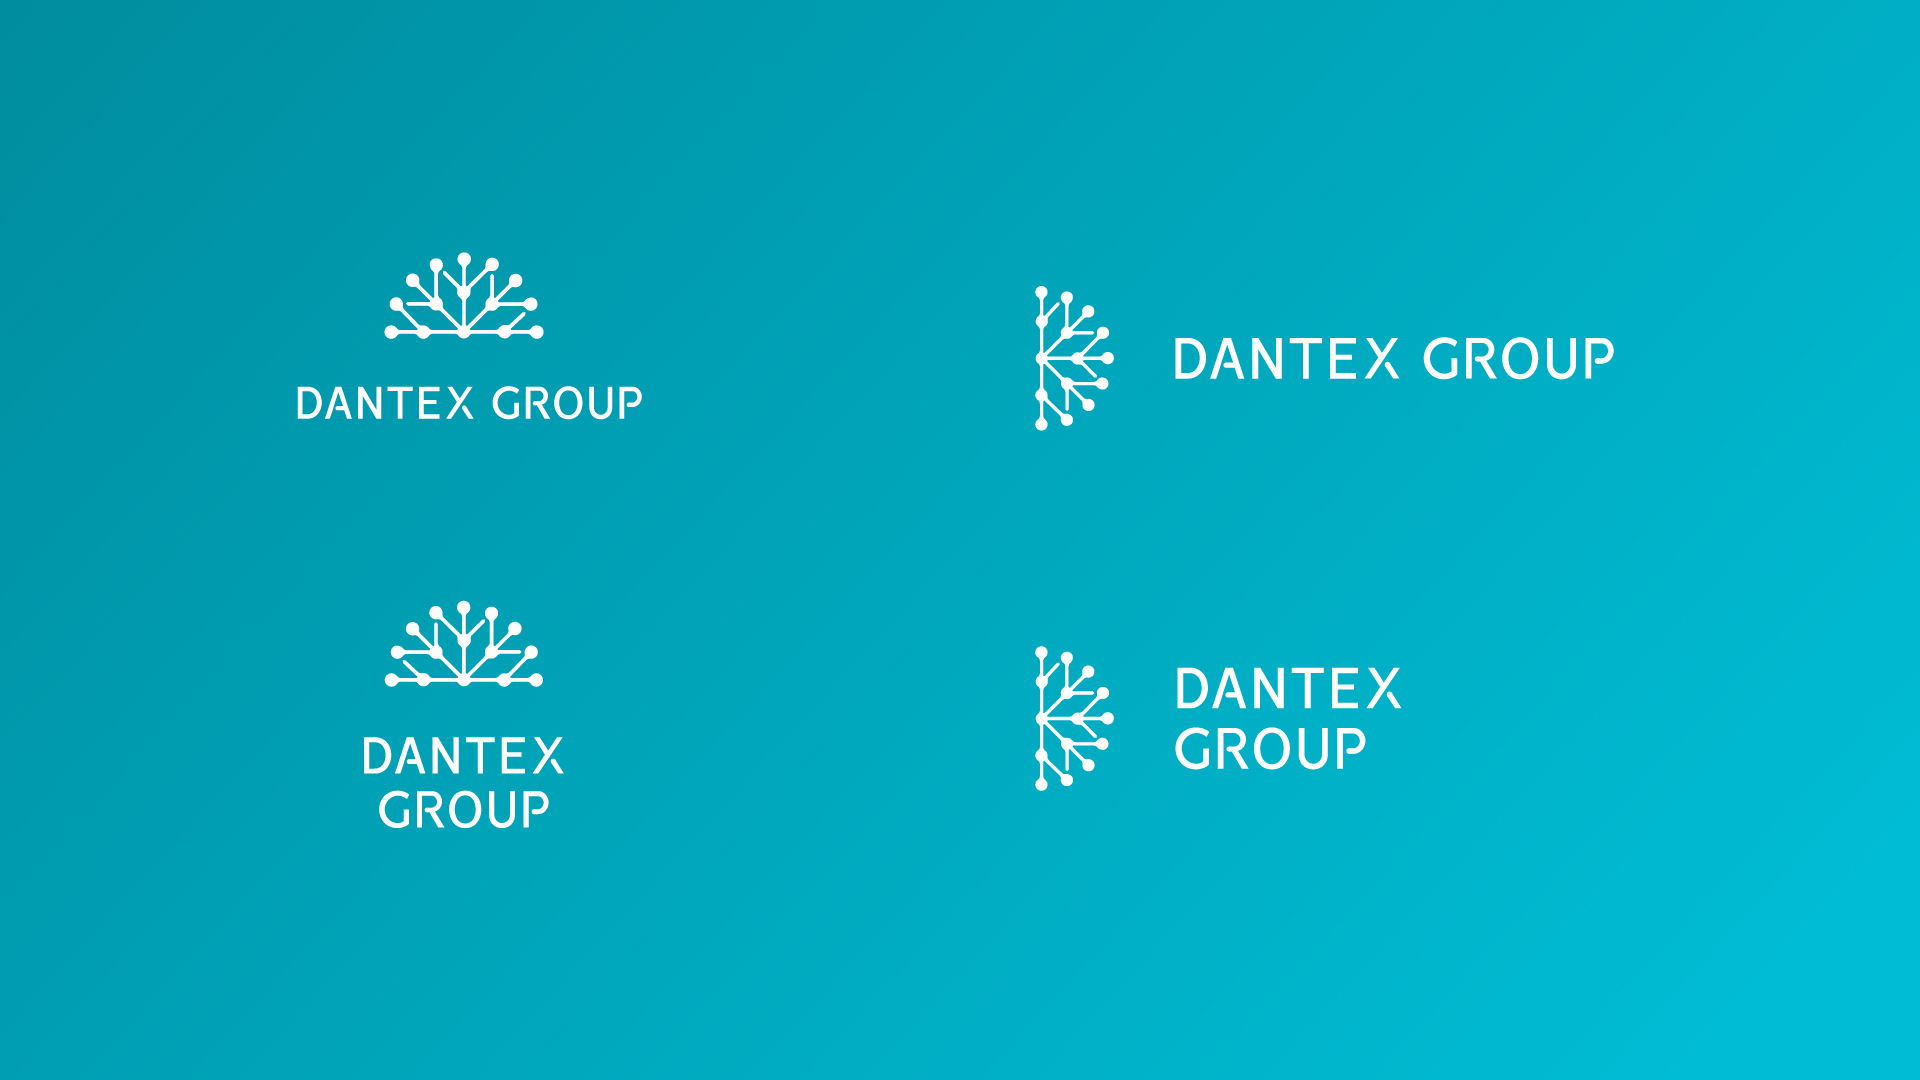 Конкурс на разработку логотипа для компании Dantex Group  фото f_6865c110ba7a0d9f.jpg